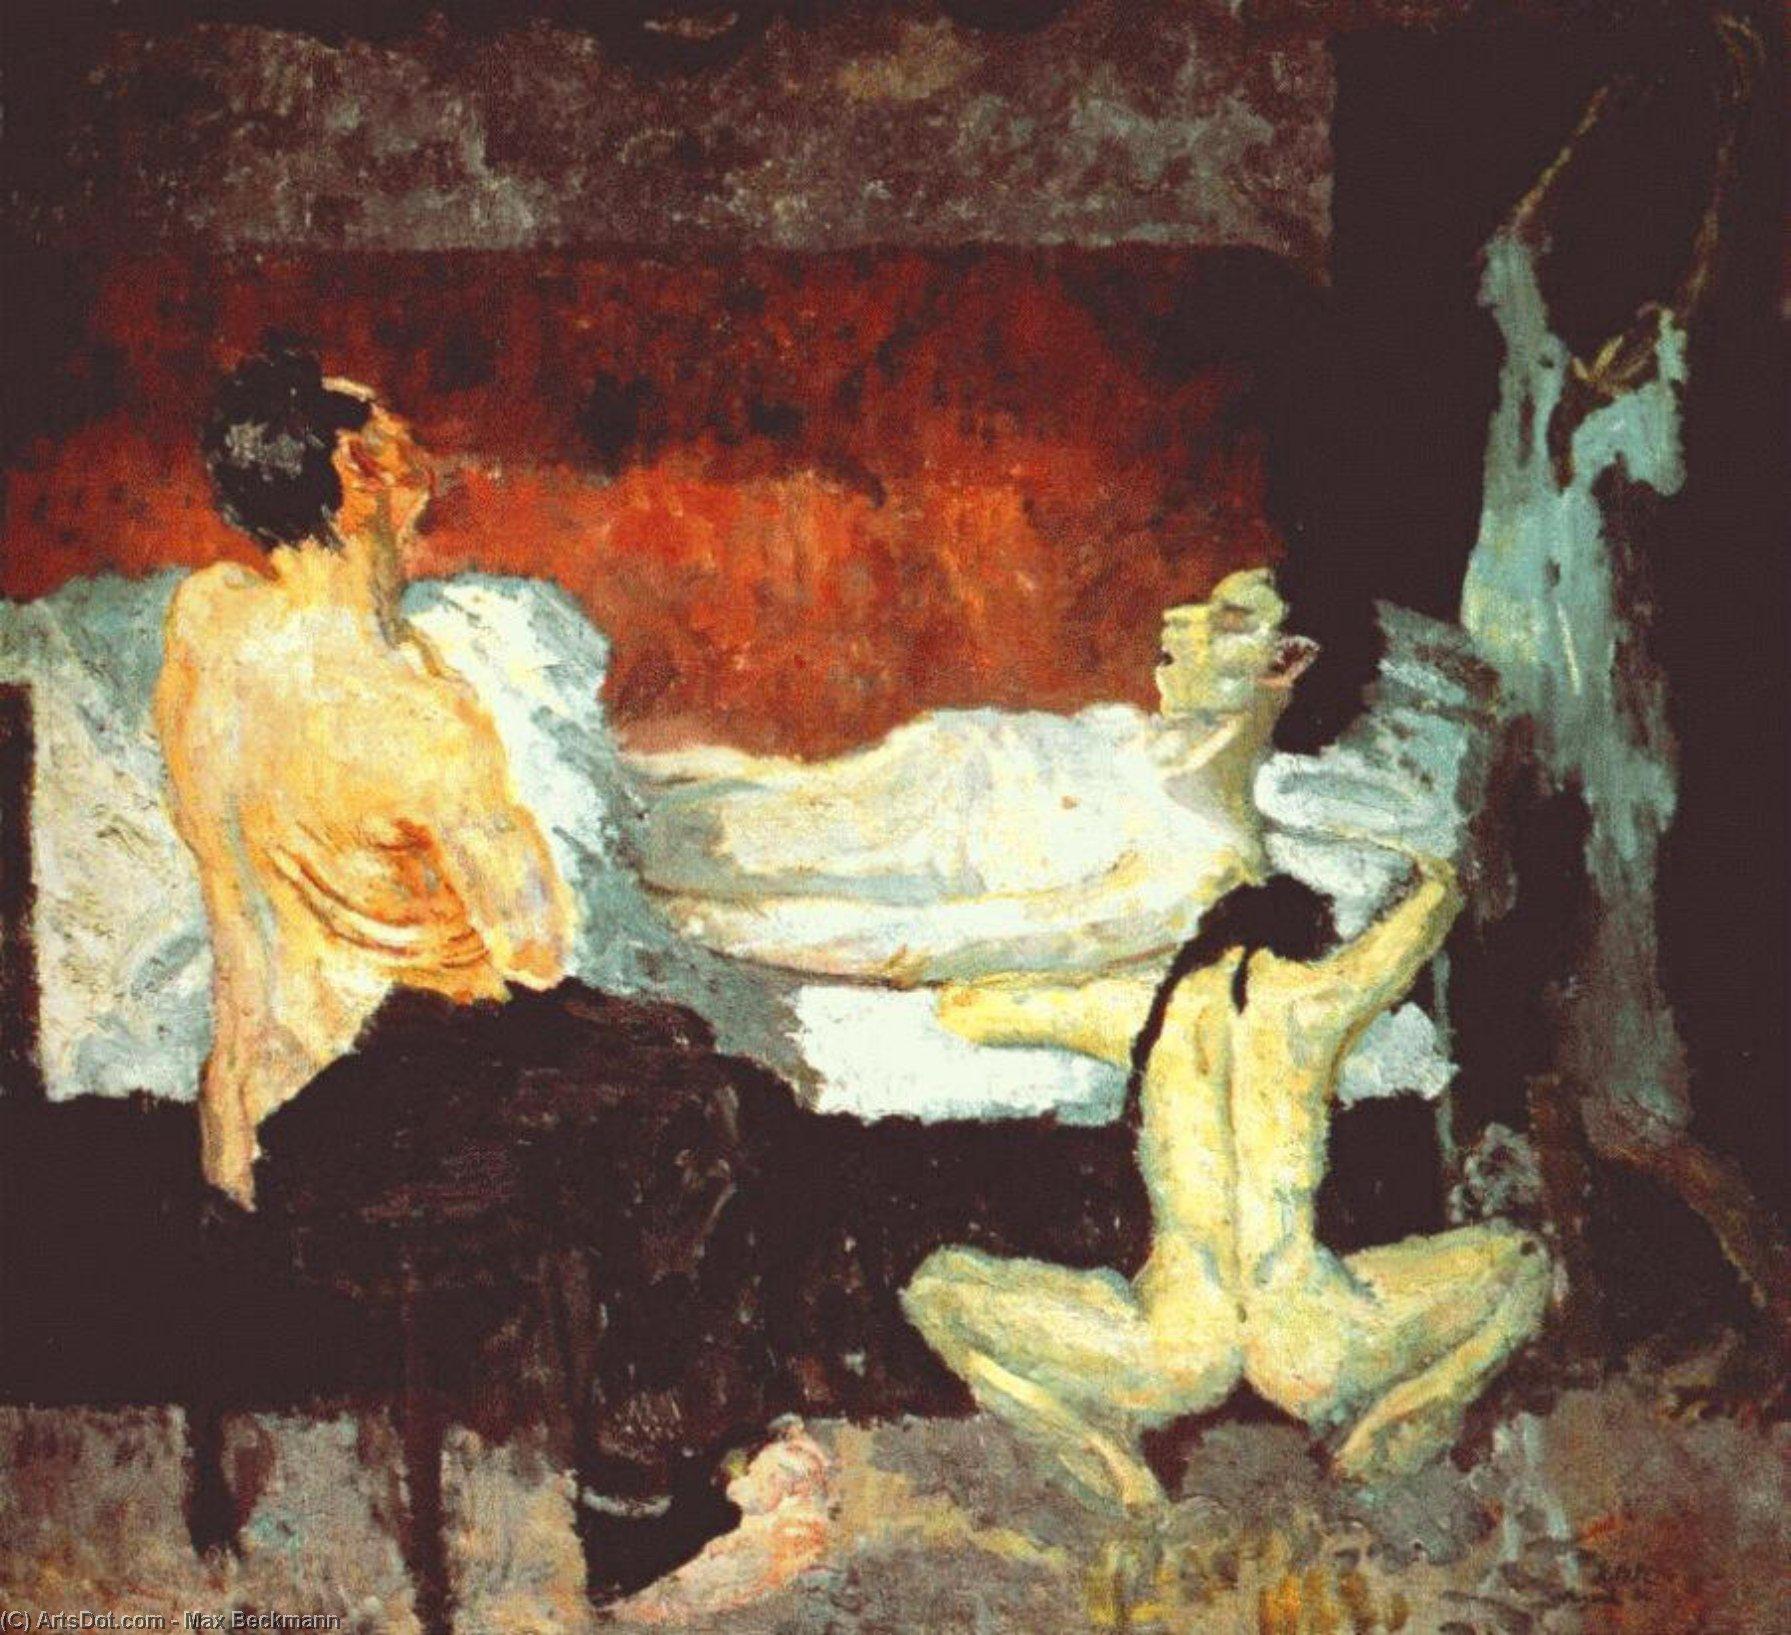 Wikoo.org - موسوعة الفنون الجميلة - اللوحة، العمل الفني Max Beckmann - Great Scene of Agony